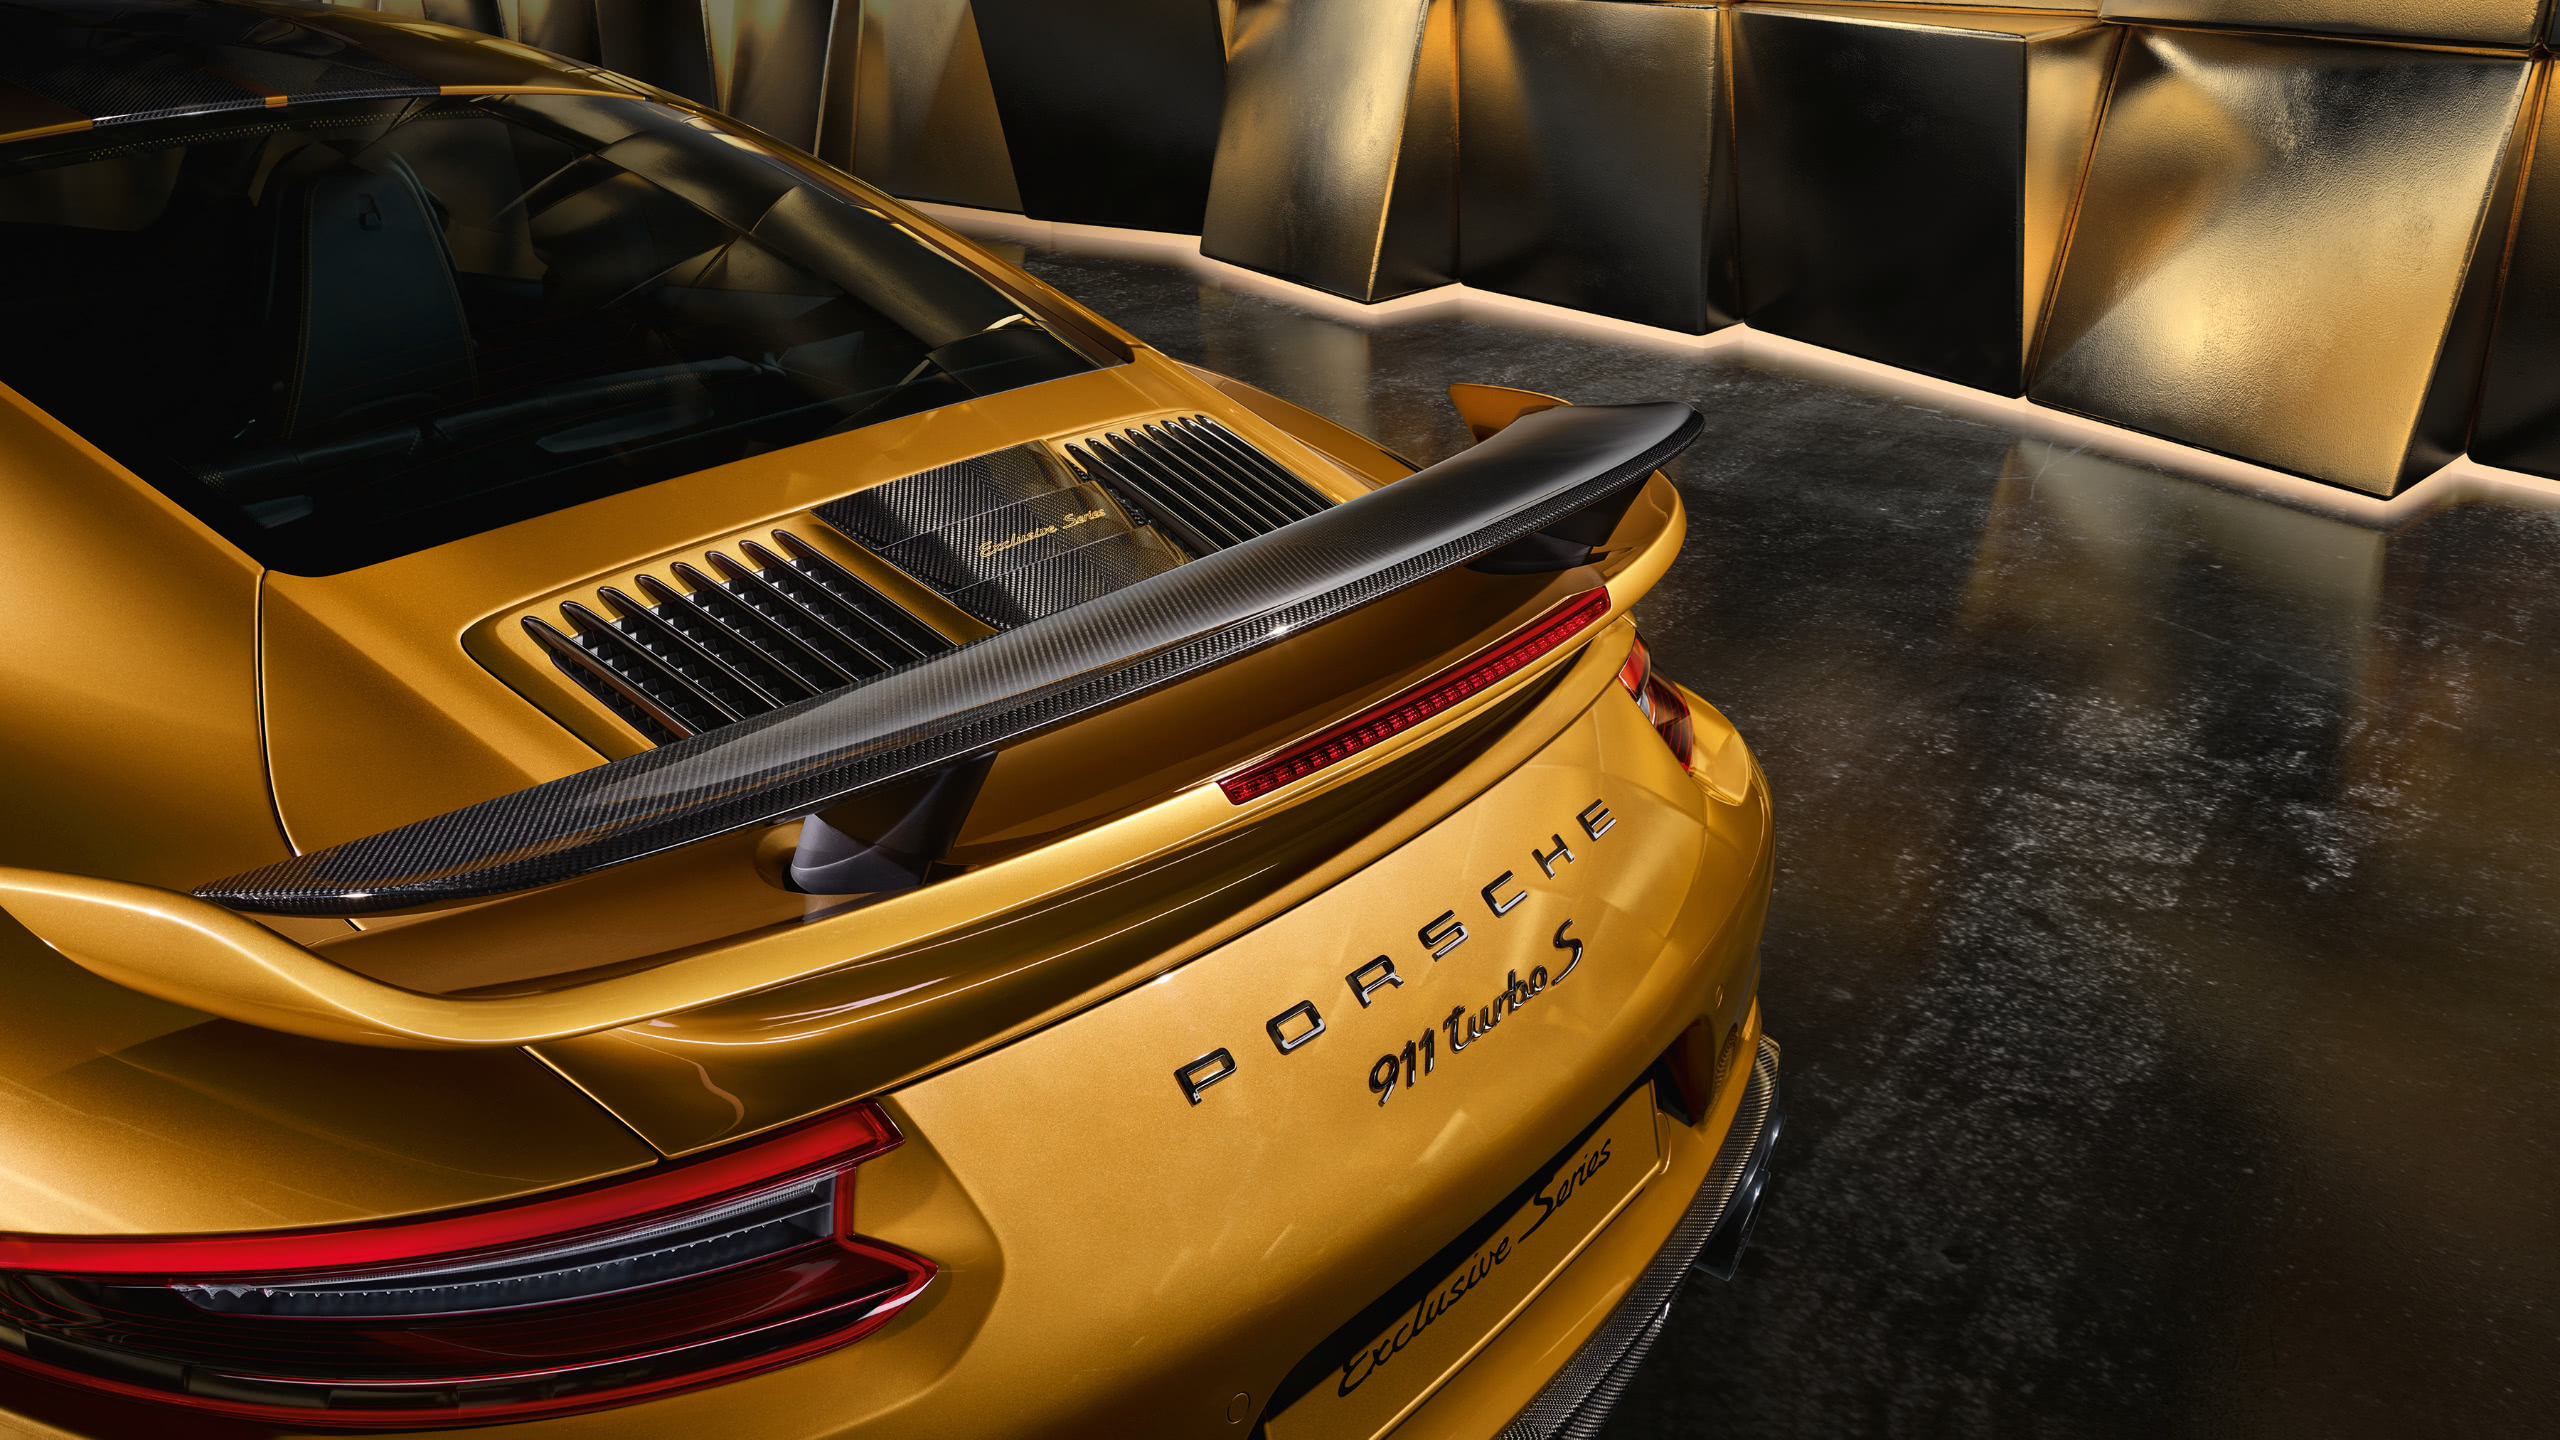 porsche 911 turbo s rear wqhd 1440p wallpaper